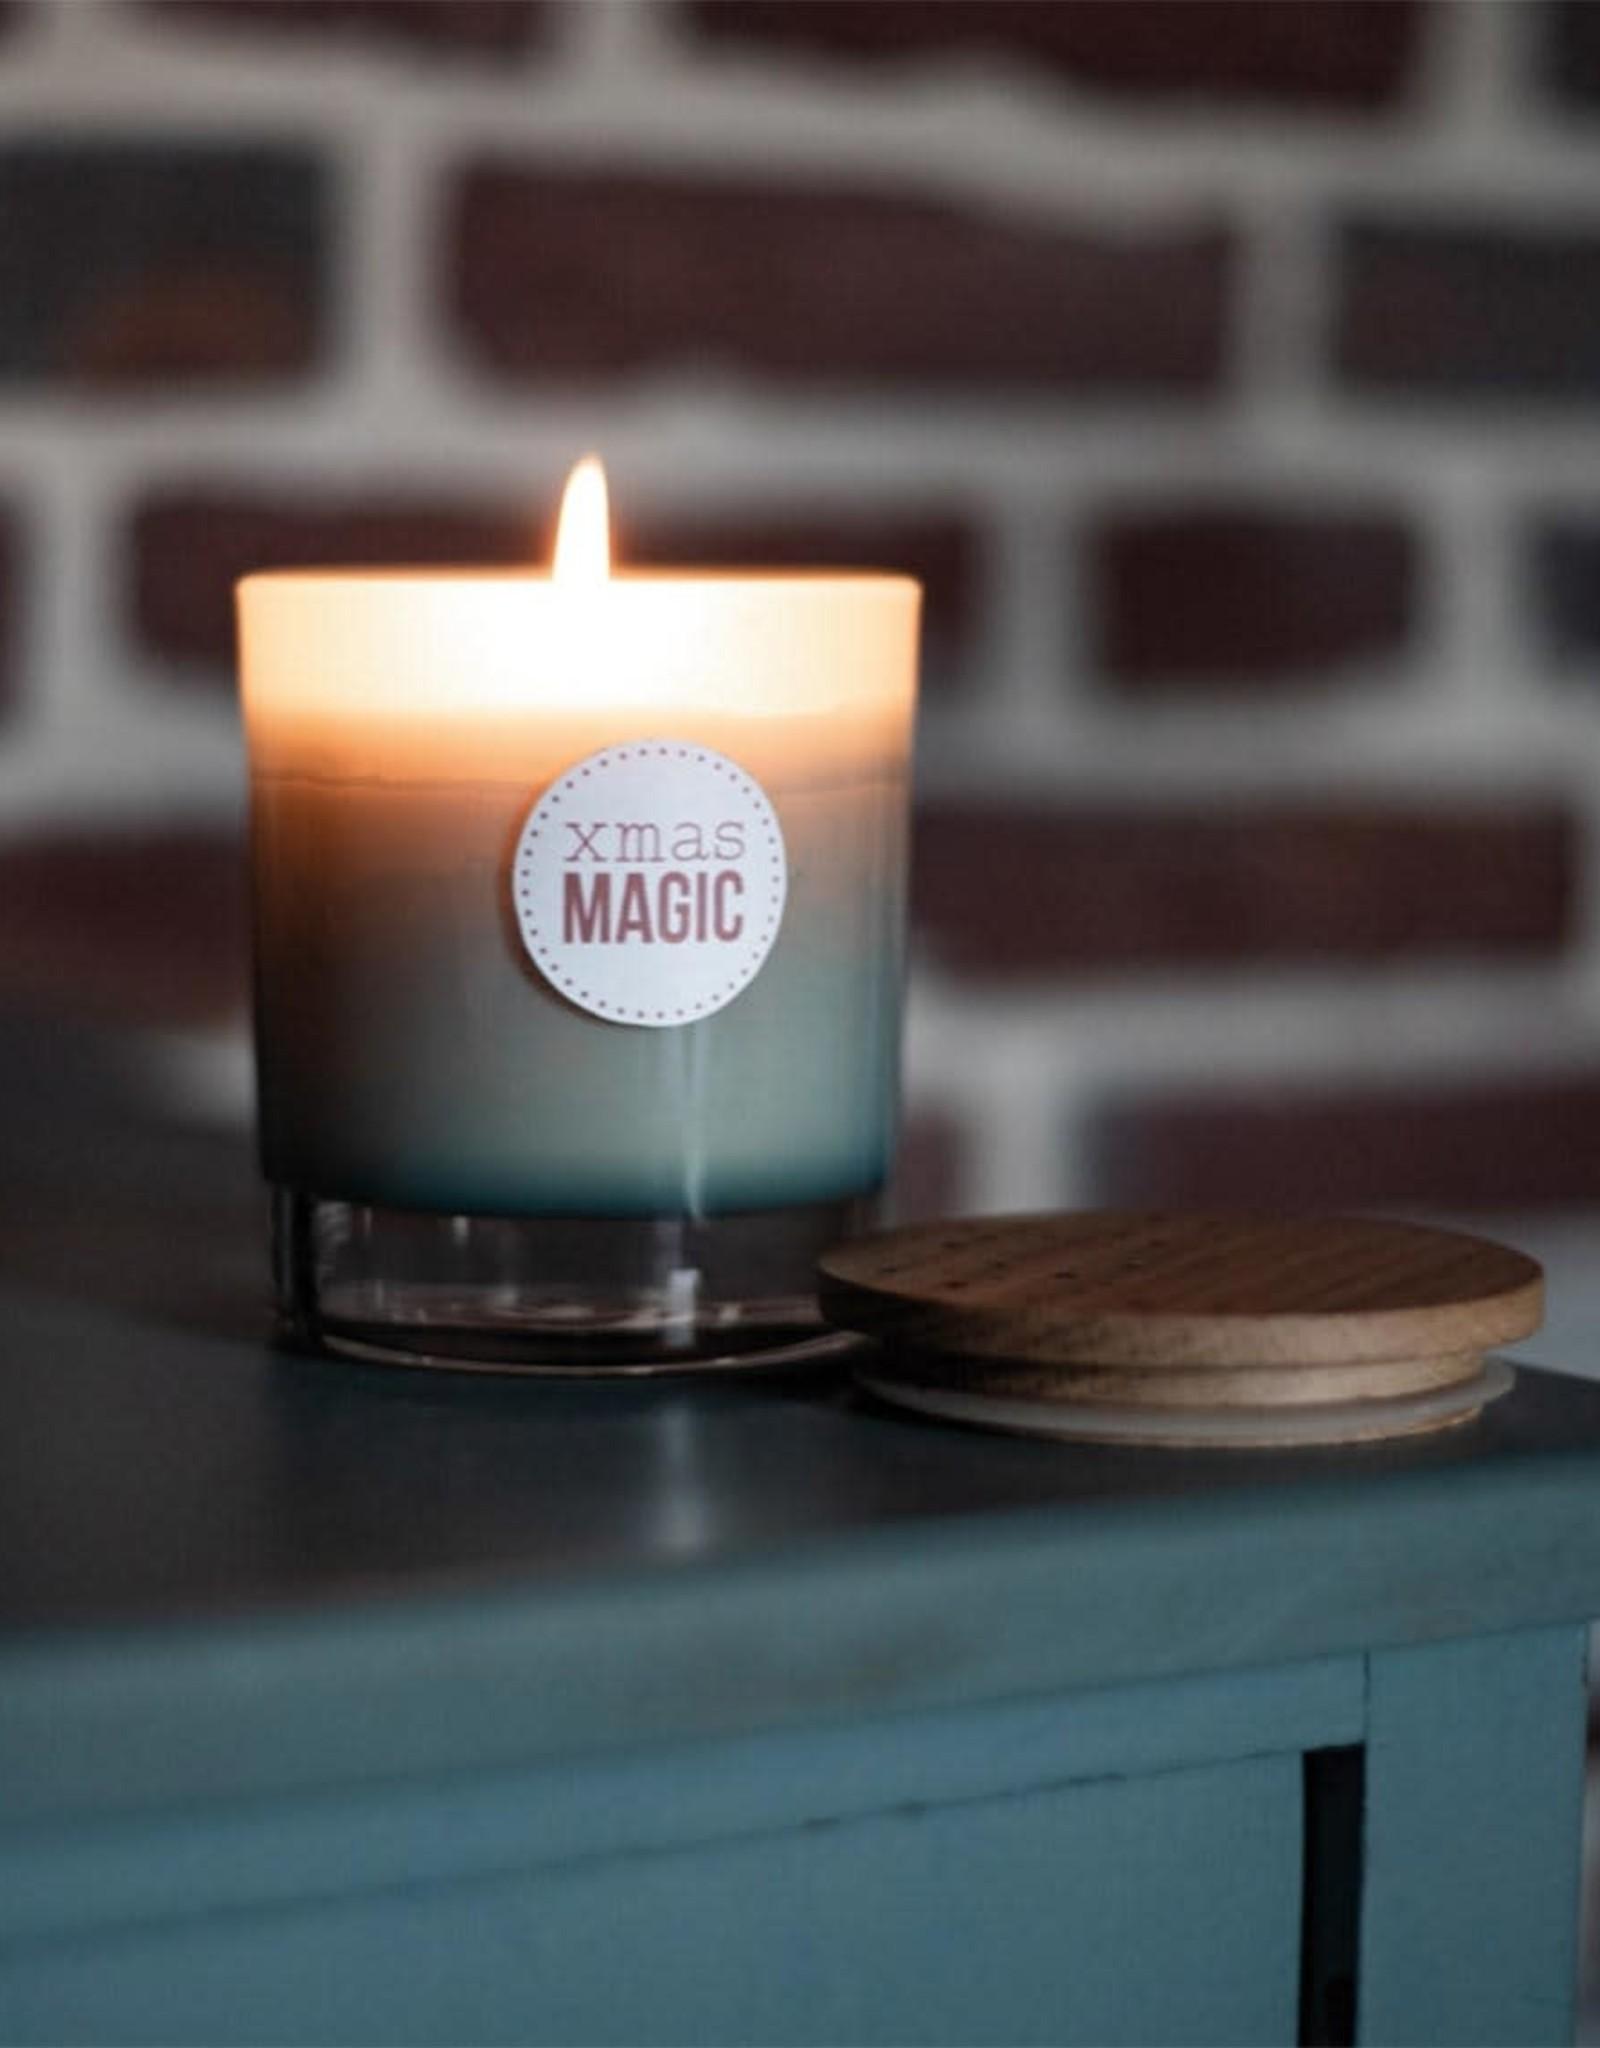 Räder Rader - Scented candle magic